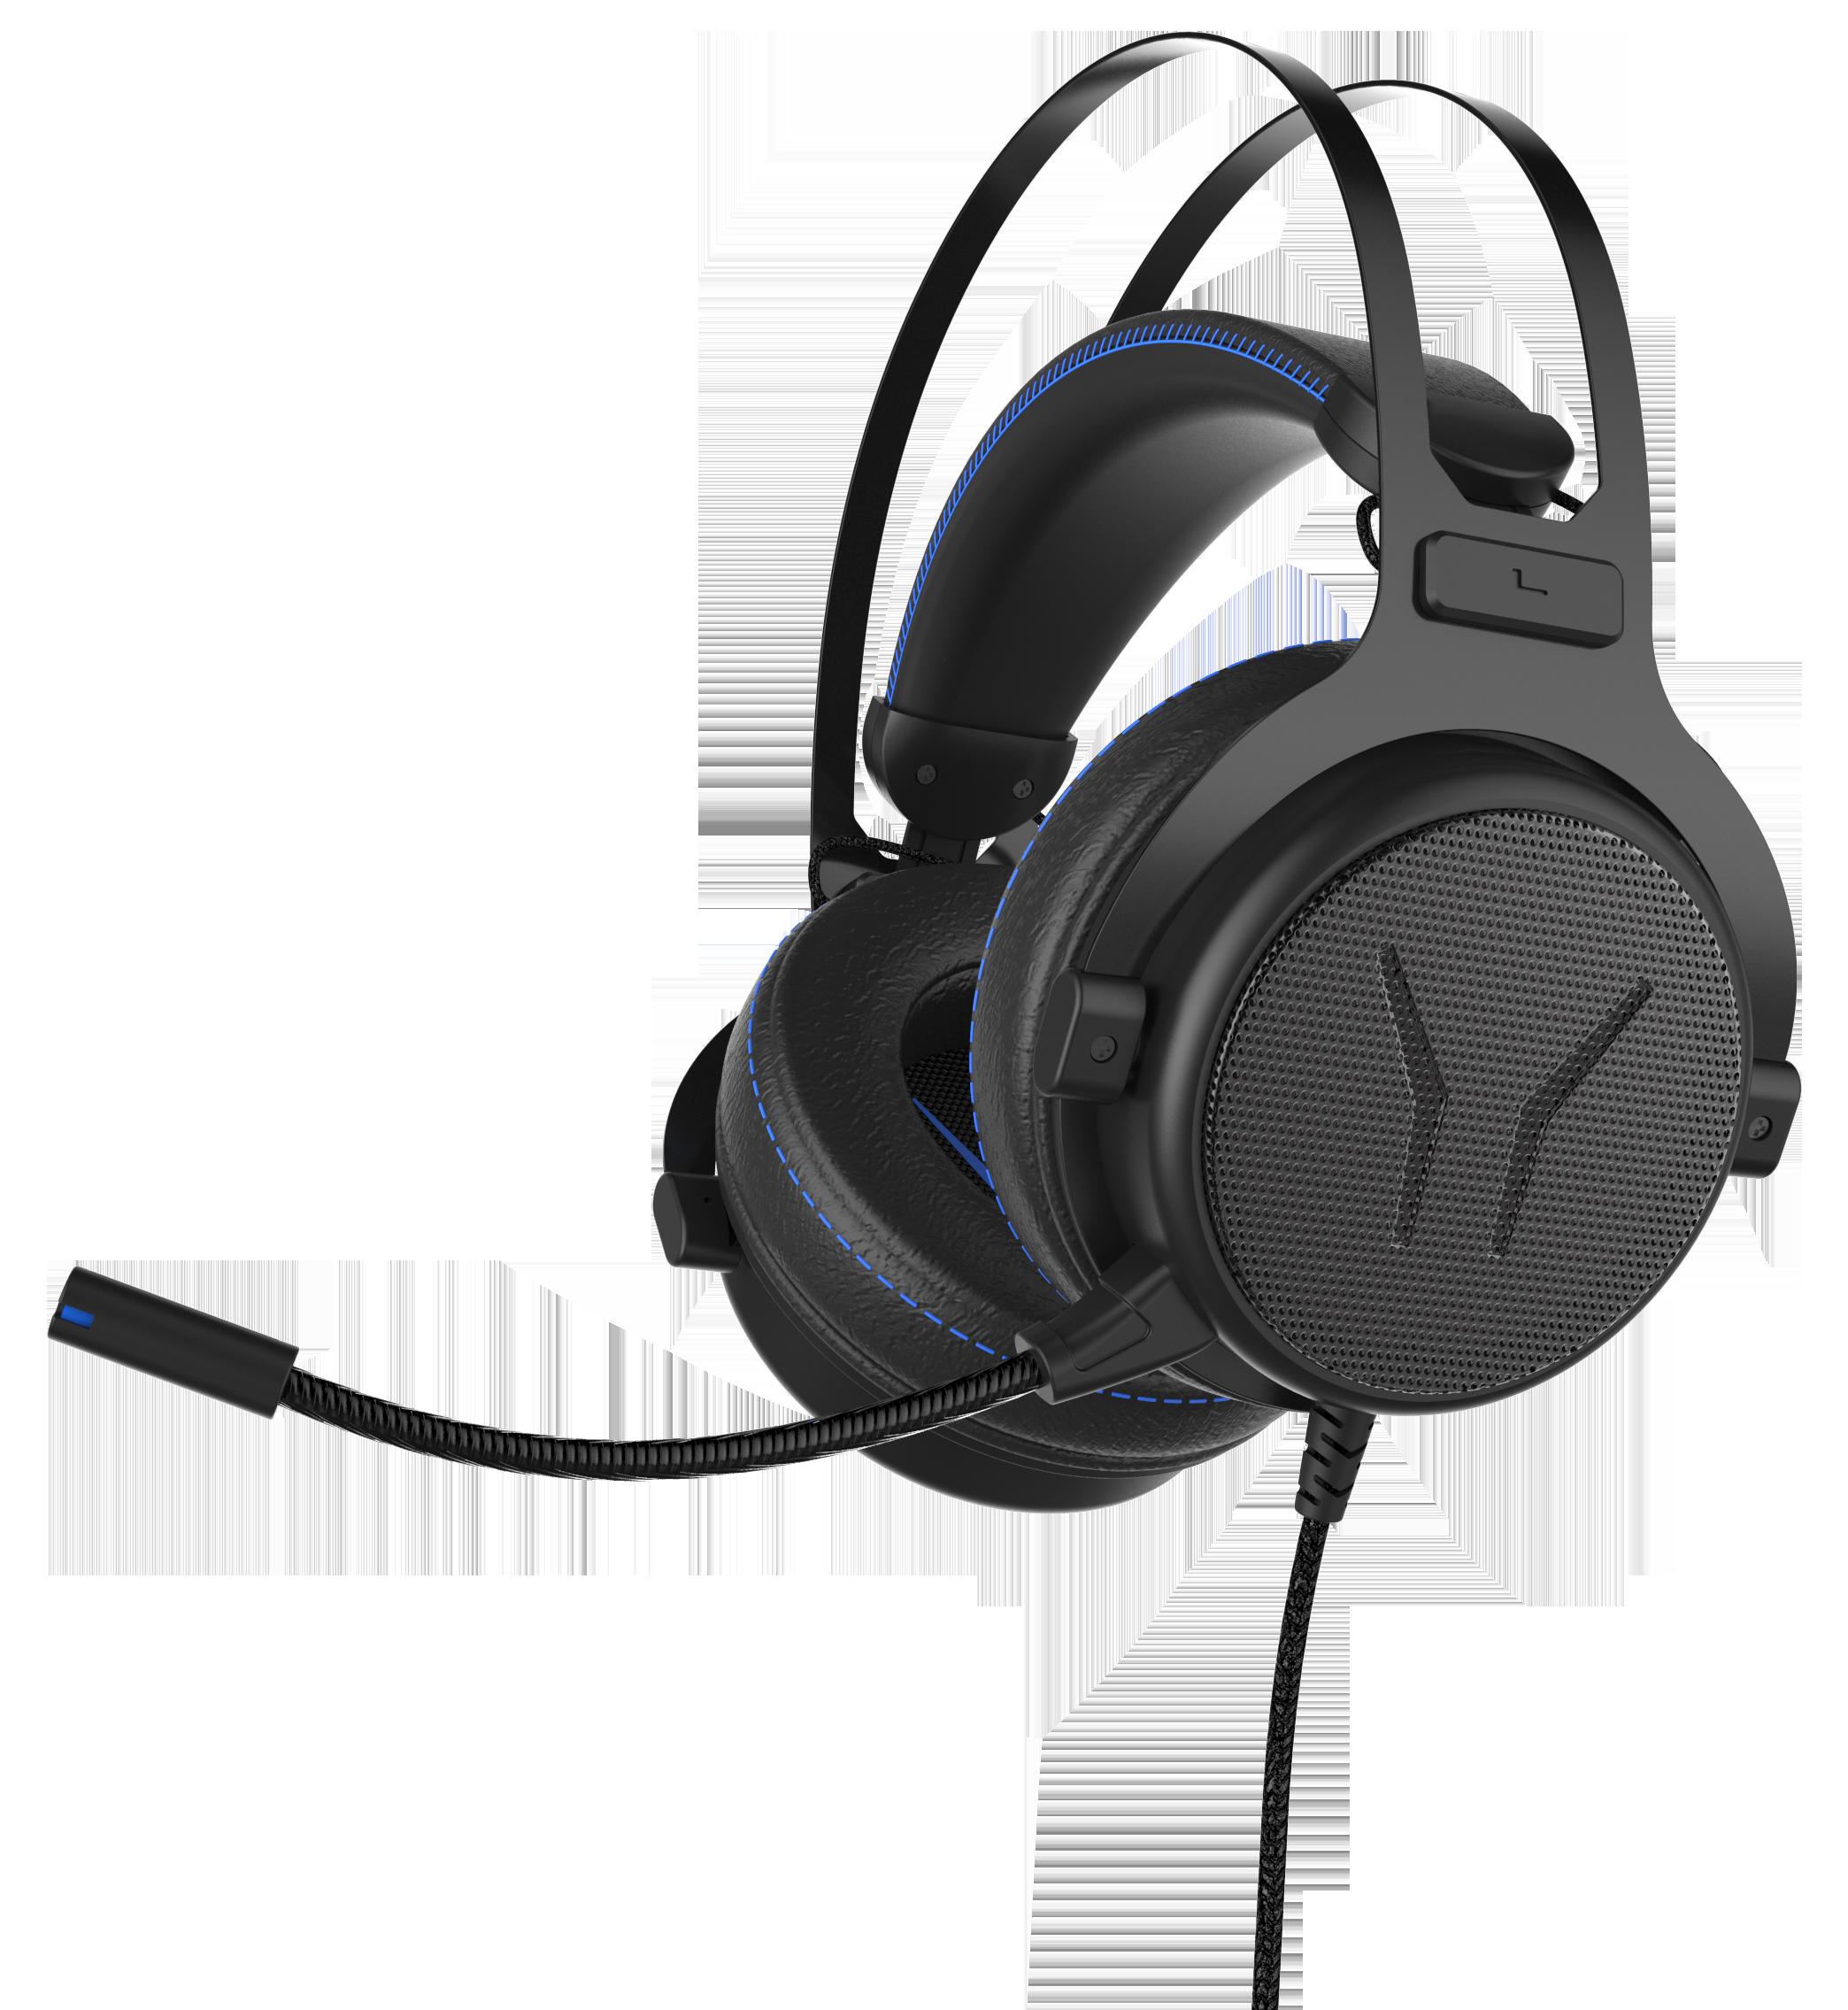 Erazer ultimate gamers headset